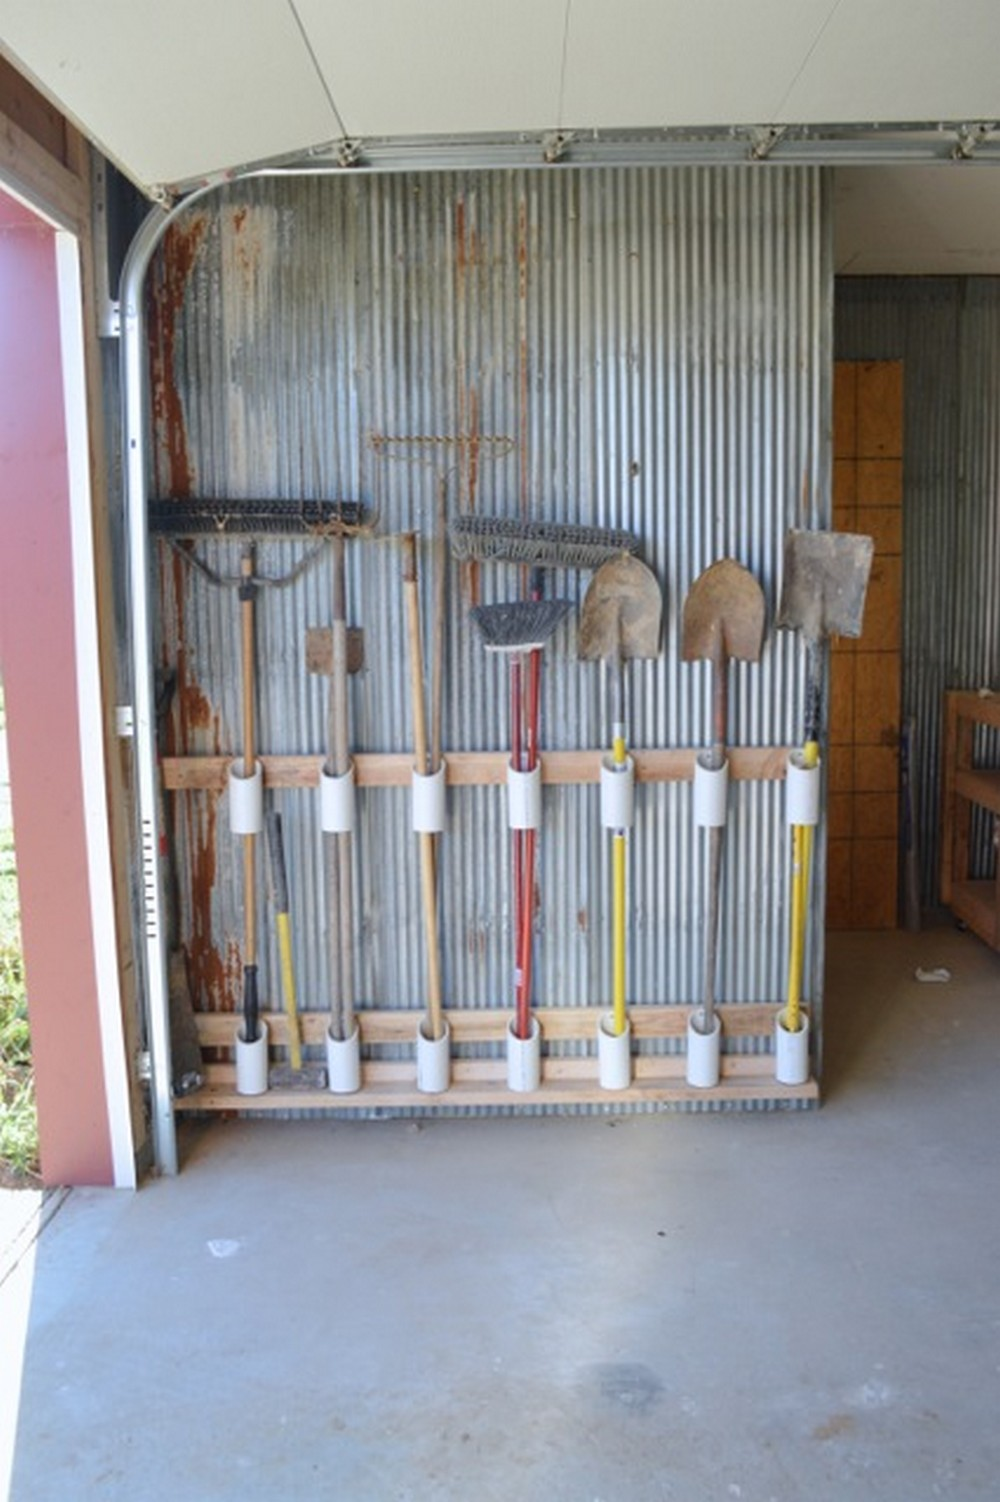 Garden Tool Storage DIY PVC Pipe Project